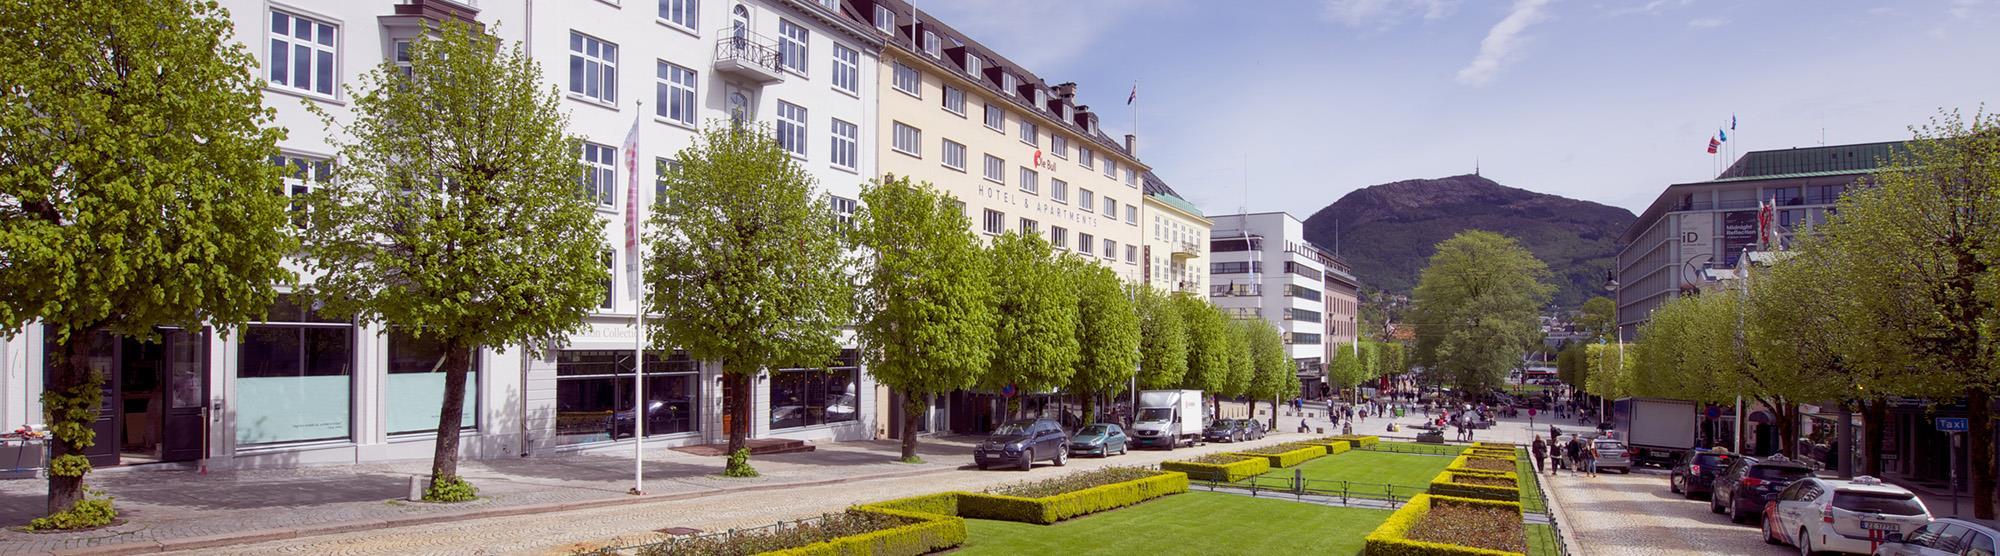 Hotels in Bergen city center